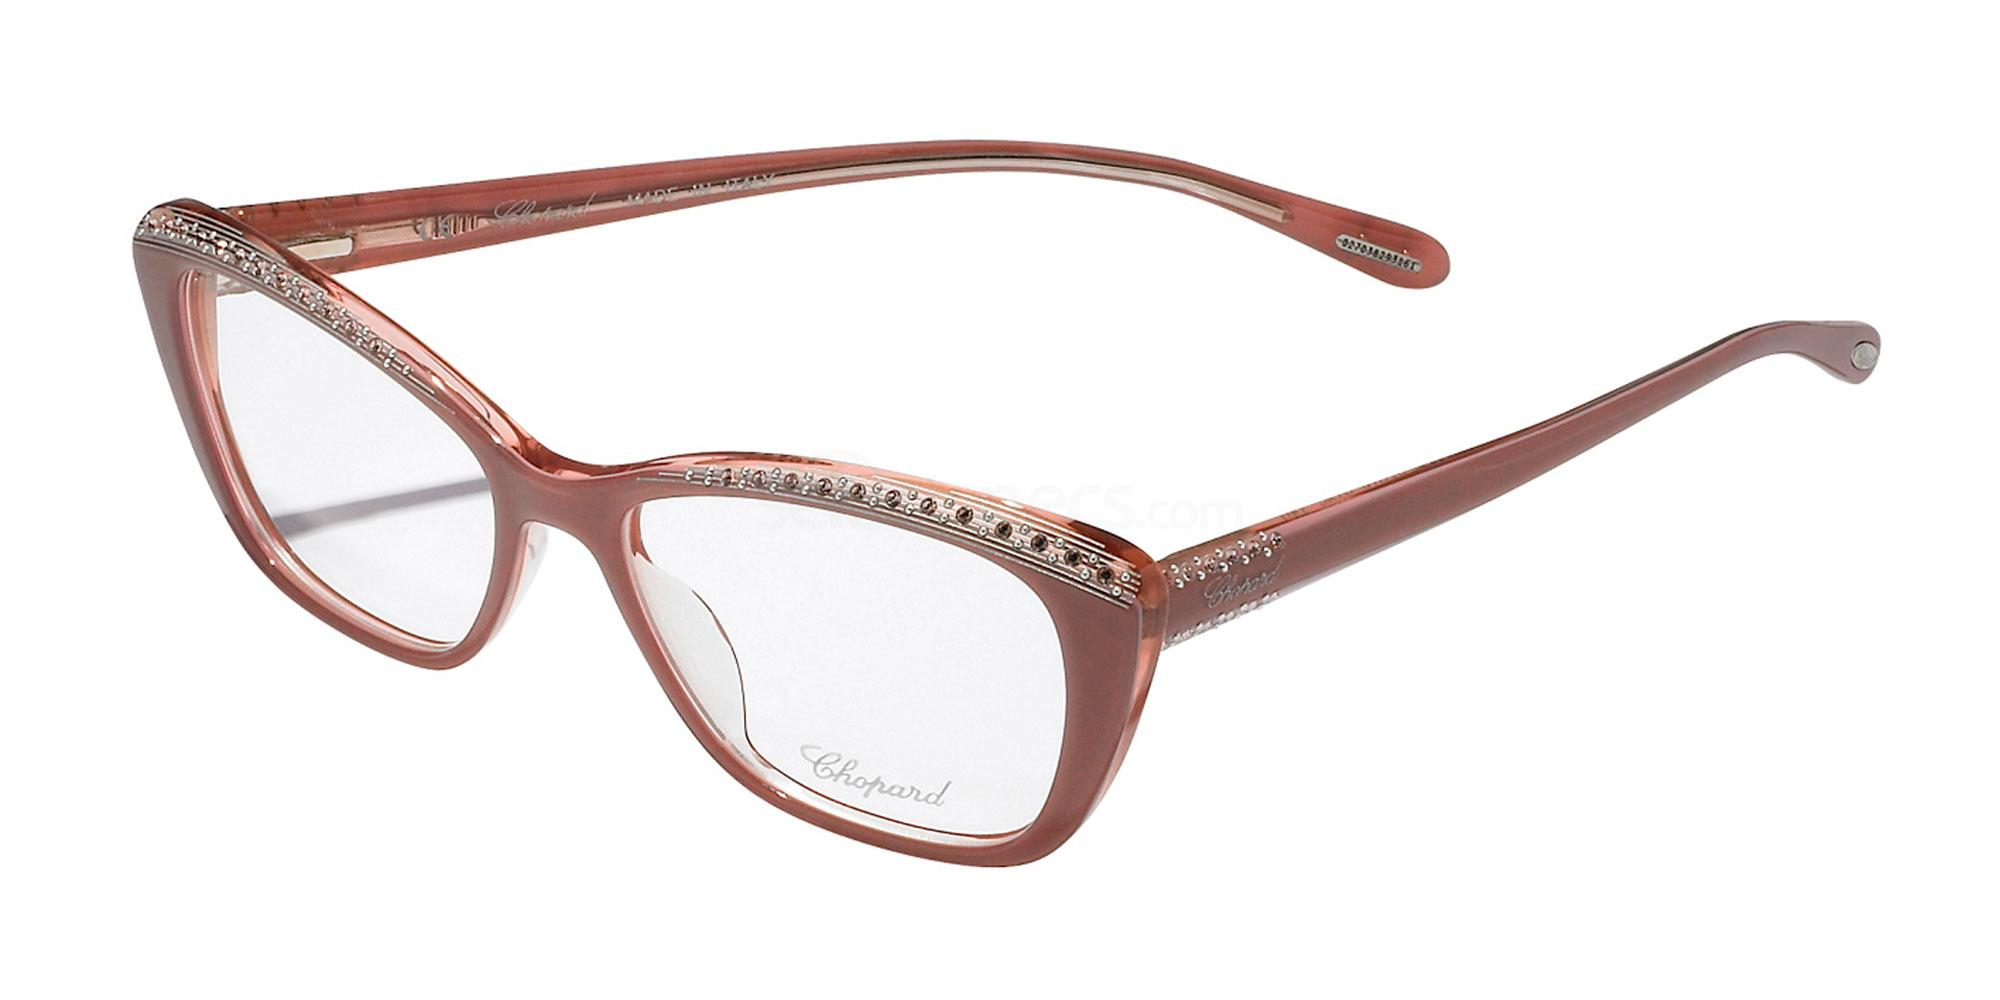 01AC VCH229R Glasses, Chopard